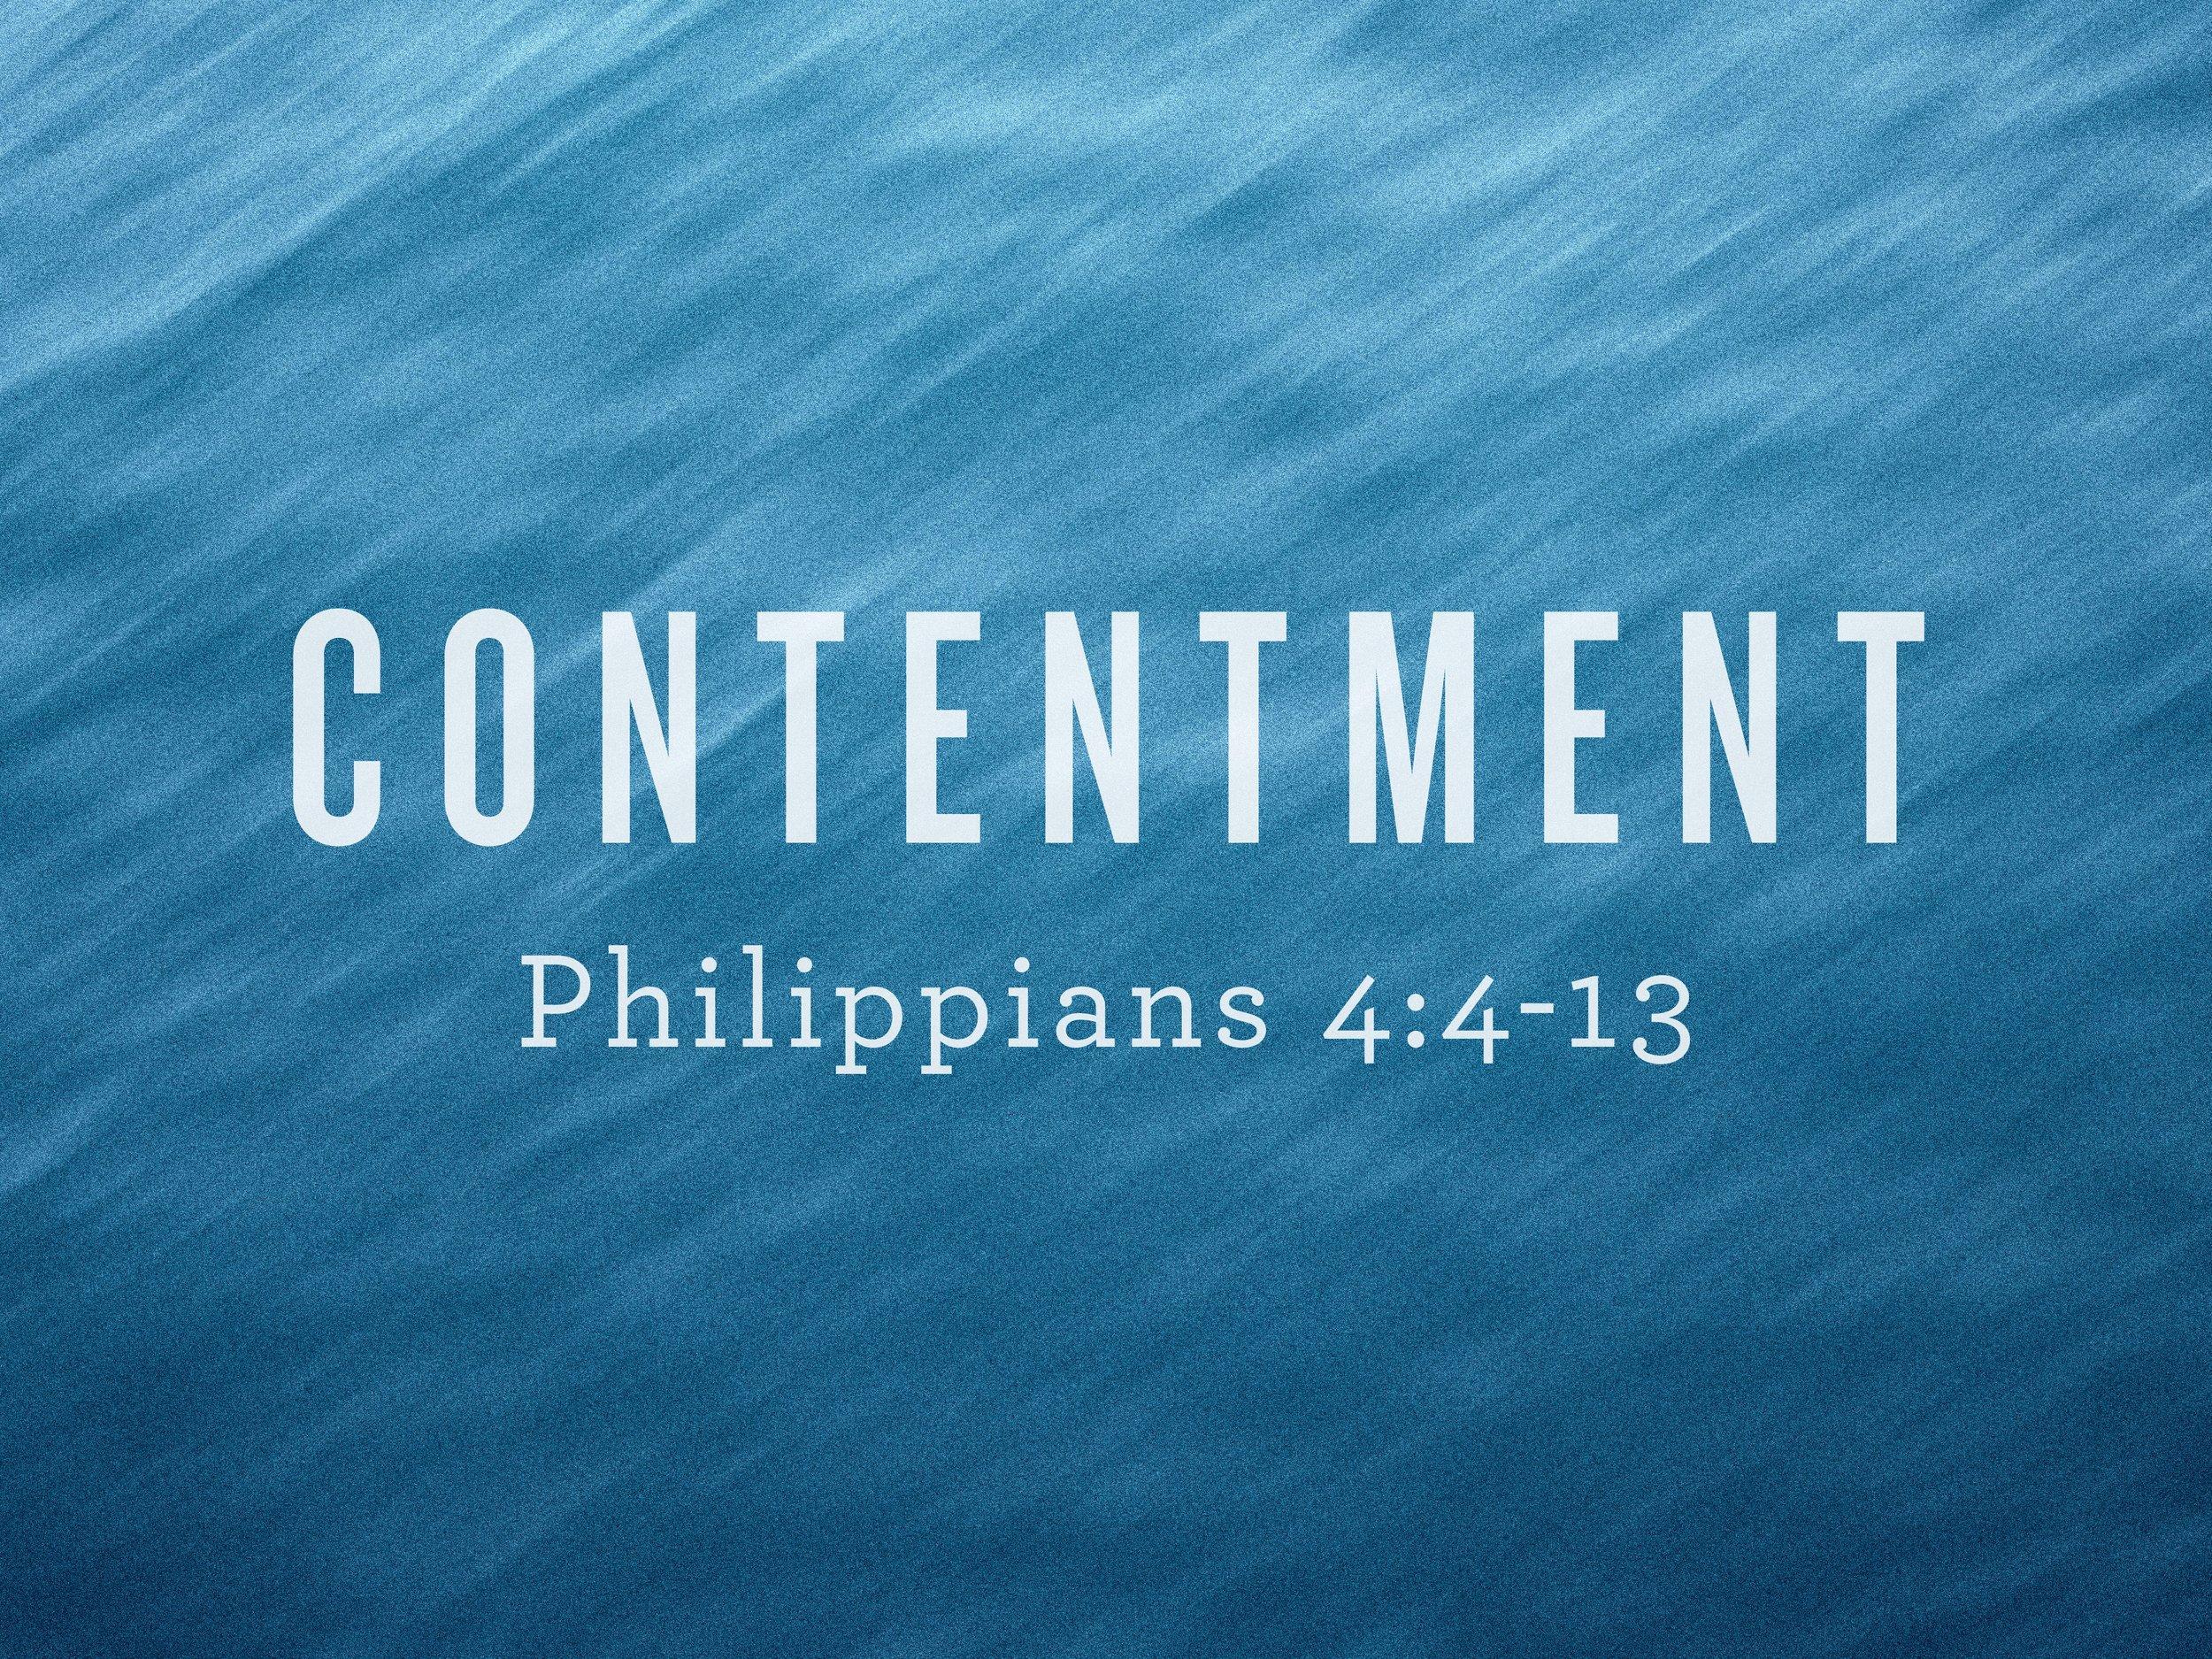 2019.05.19 Contentment Sermon Slide.jpg